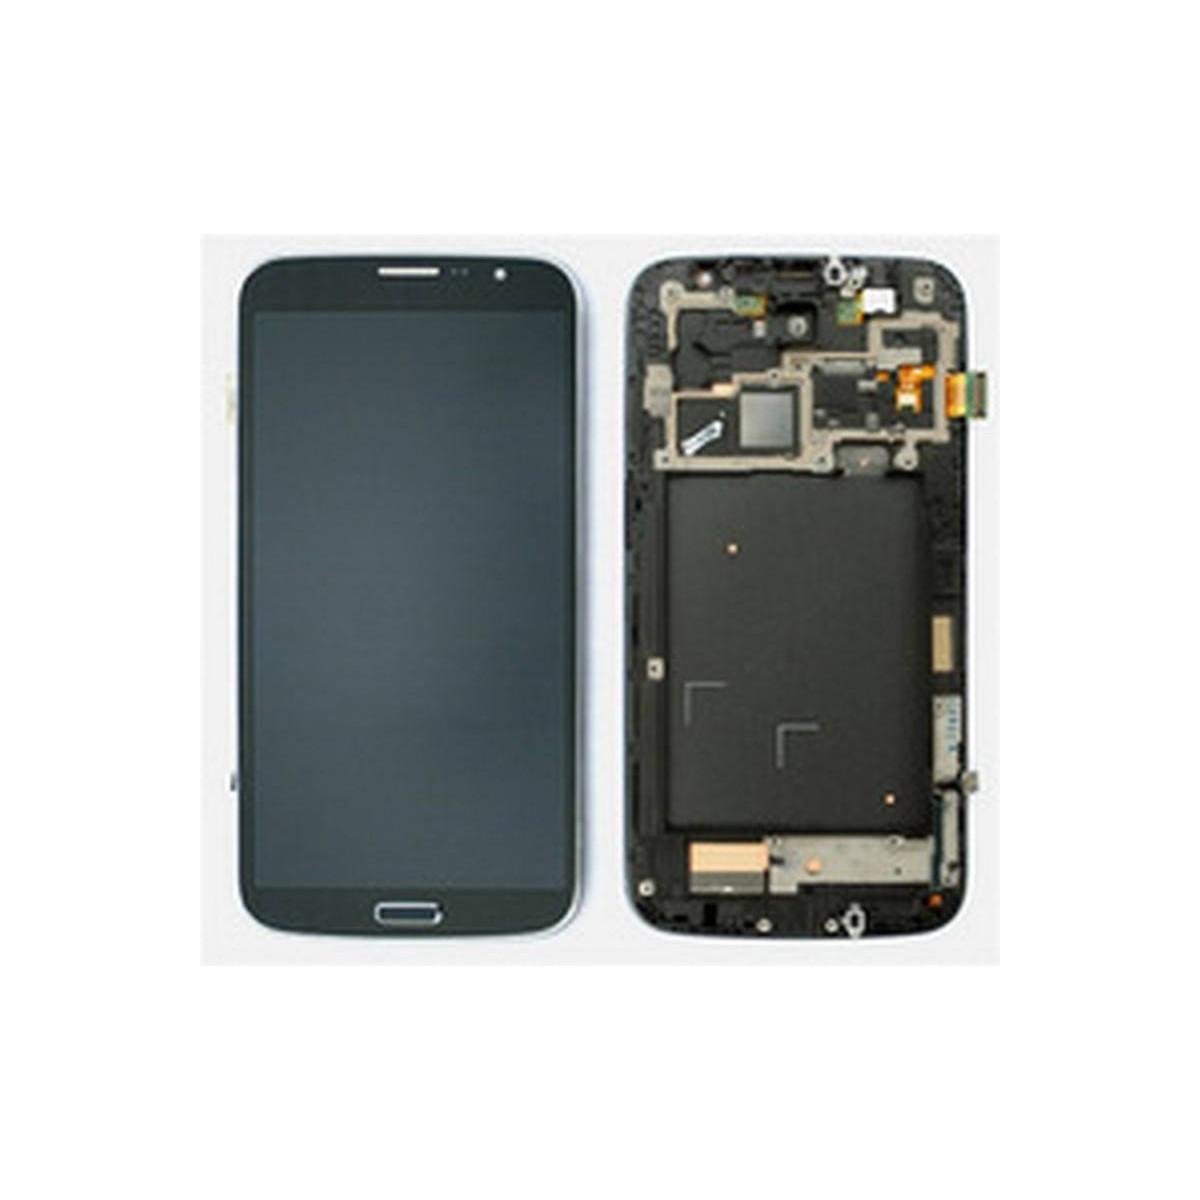 Ecrã completa azul samung galaxy mega 6.3 N9200 N9205